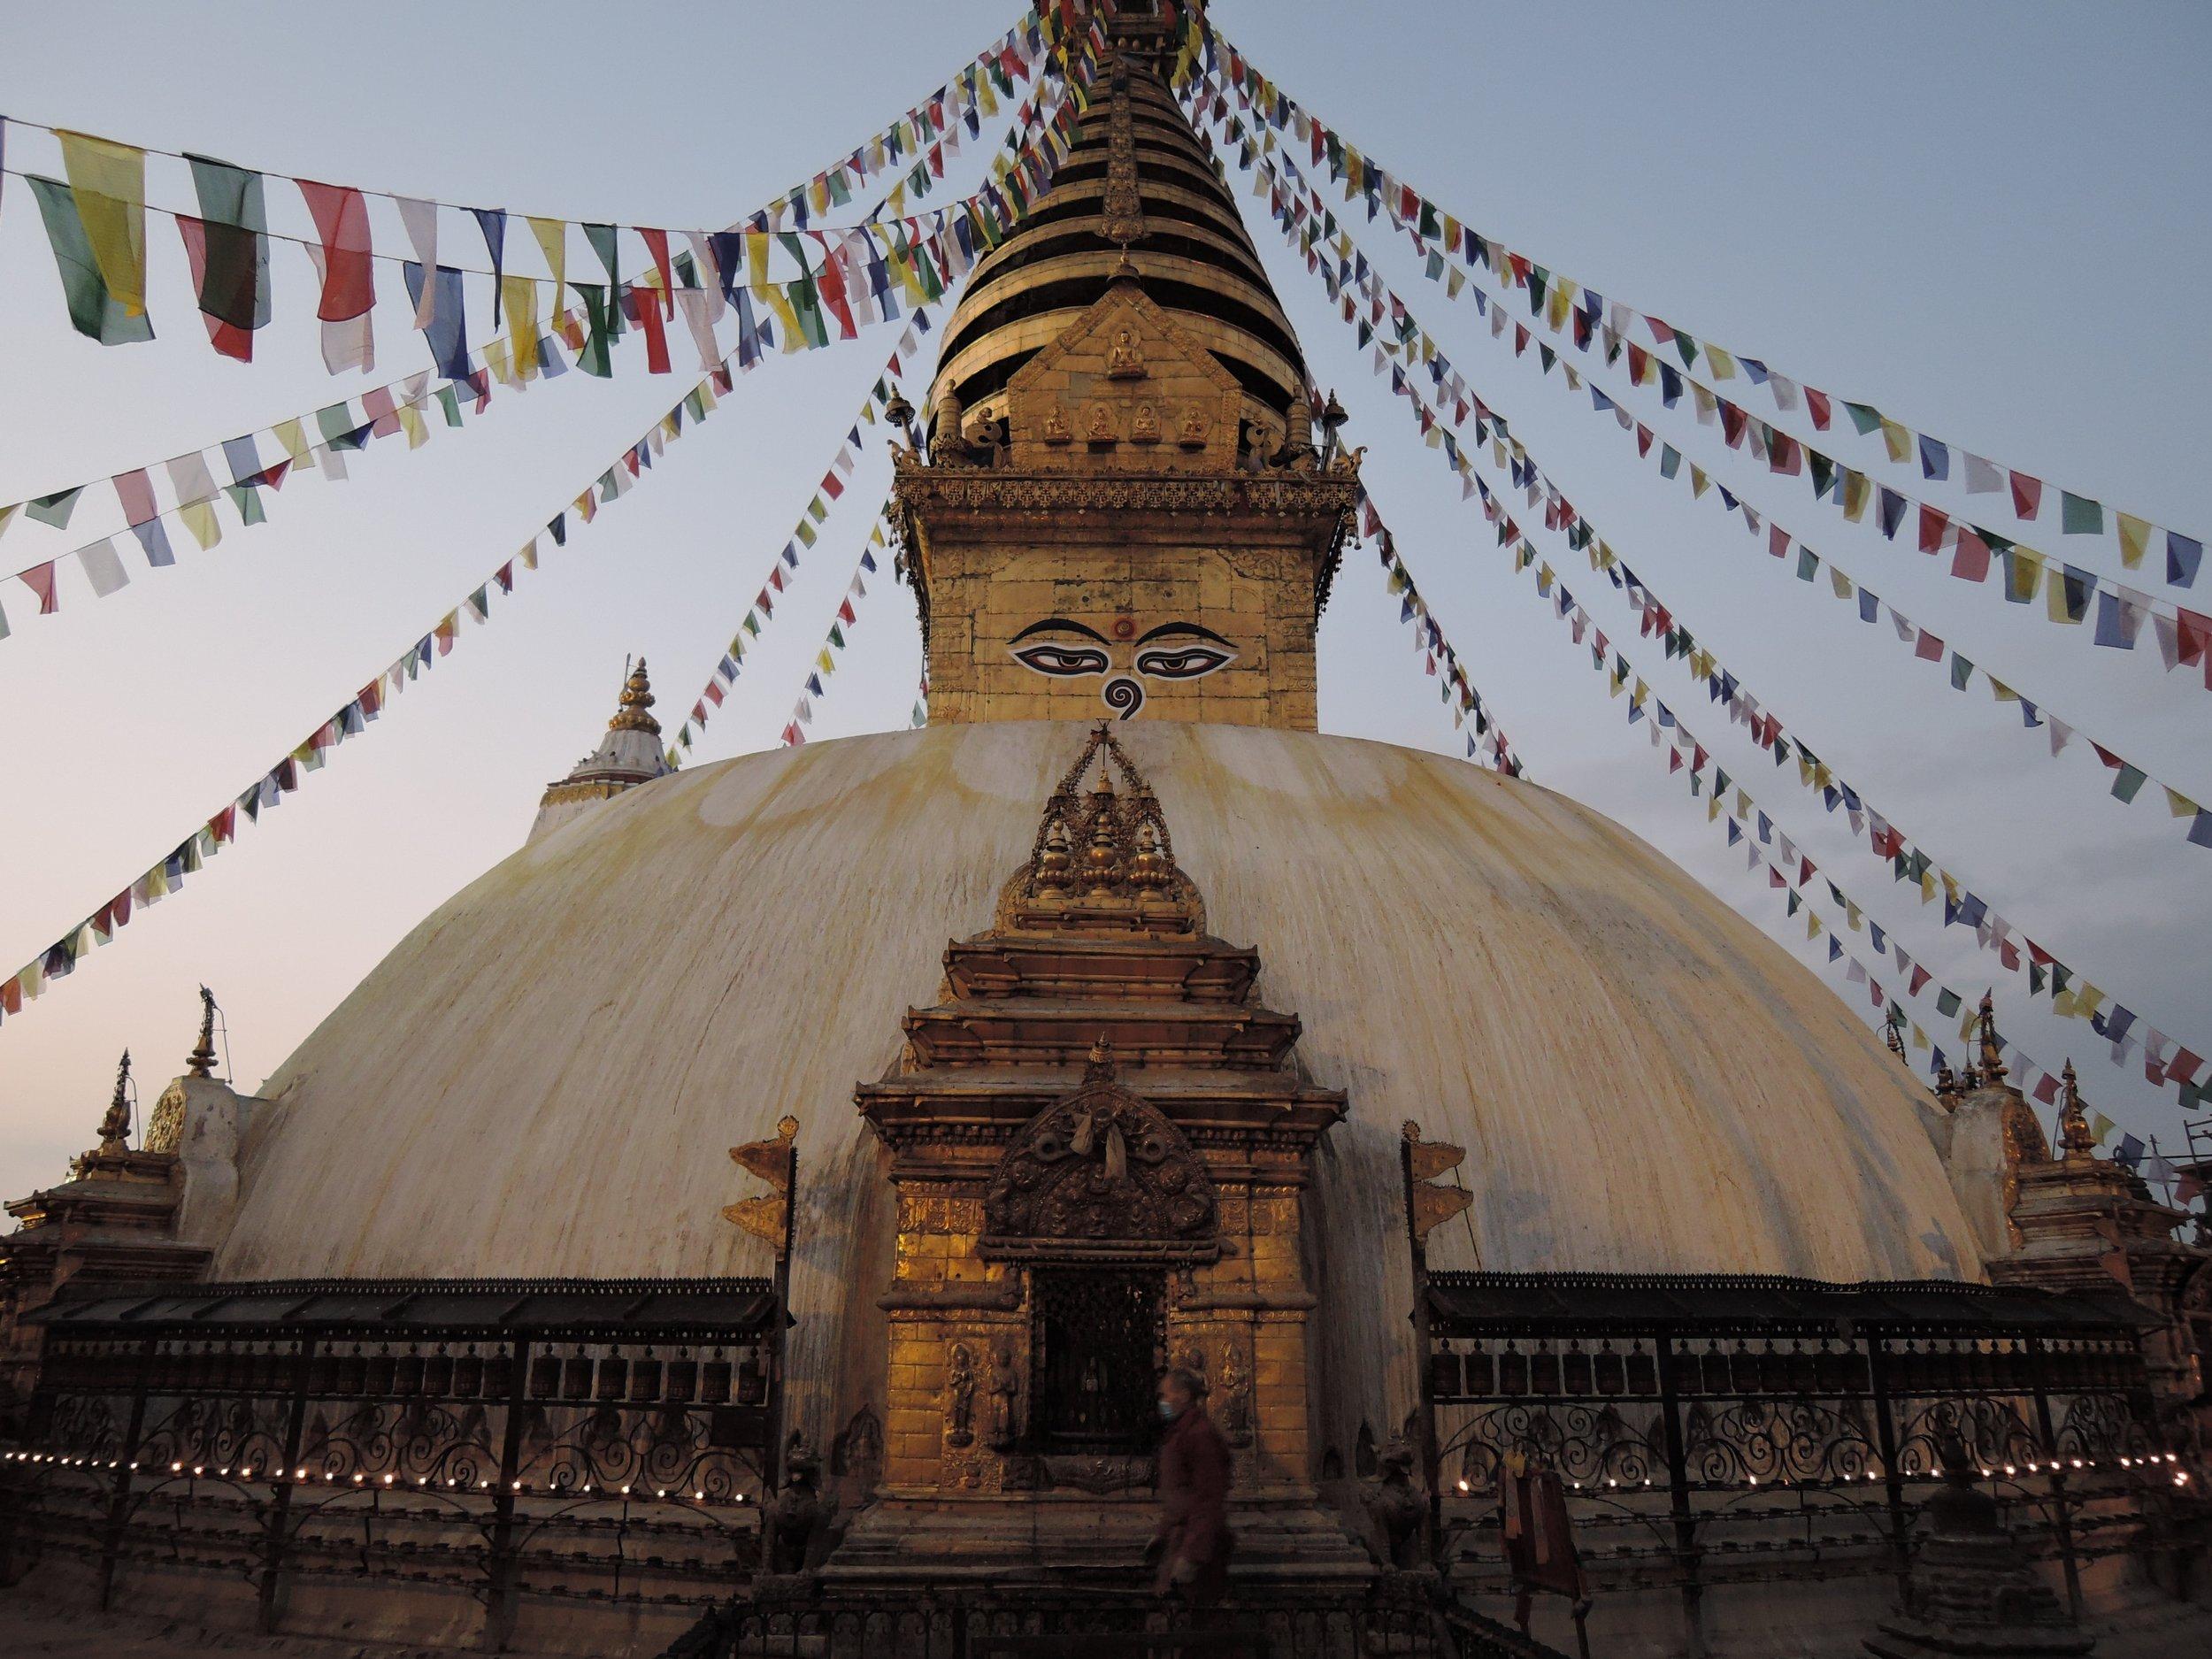 Kathmandu and Annapurna, Nepal temple with prayer flags